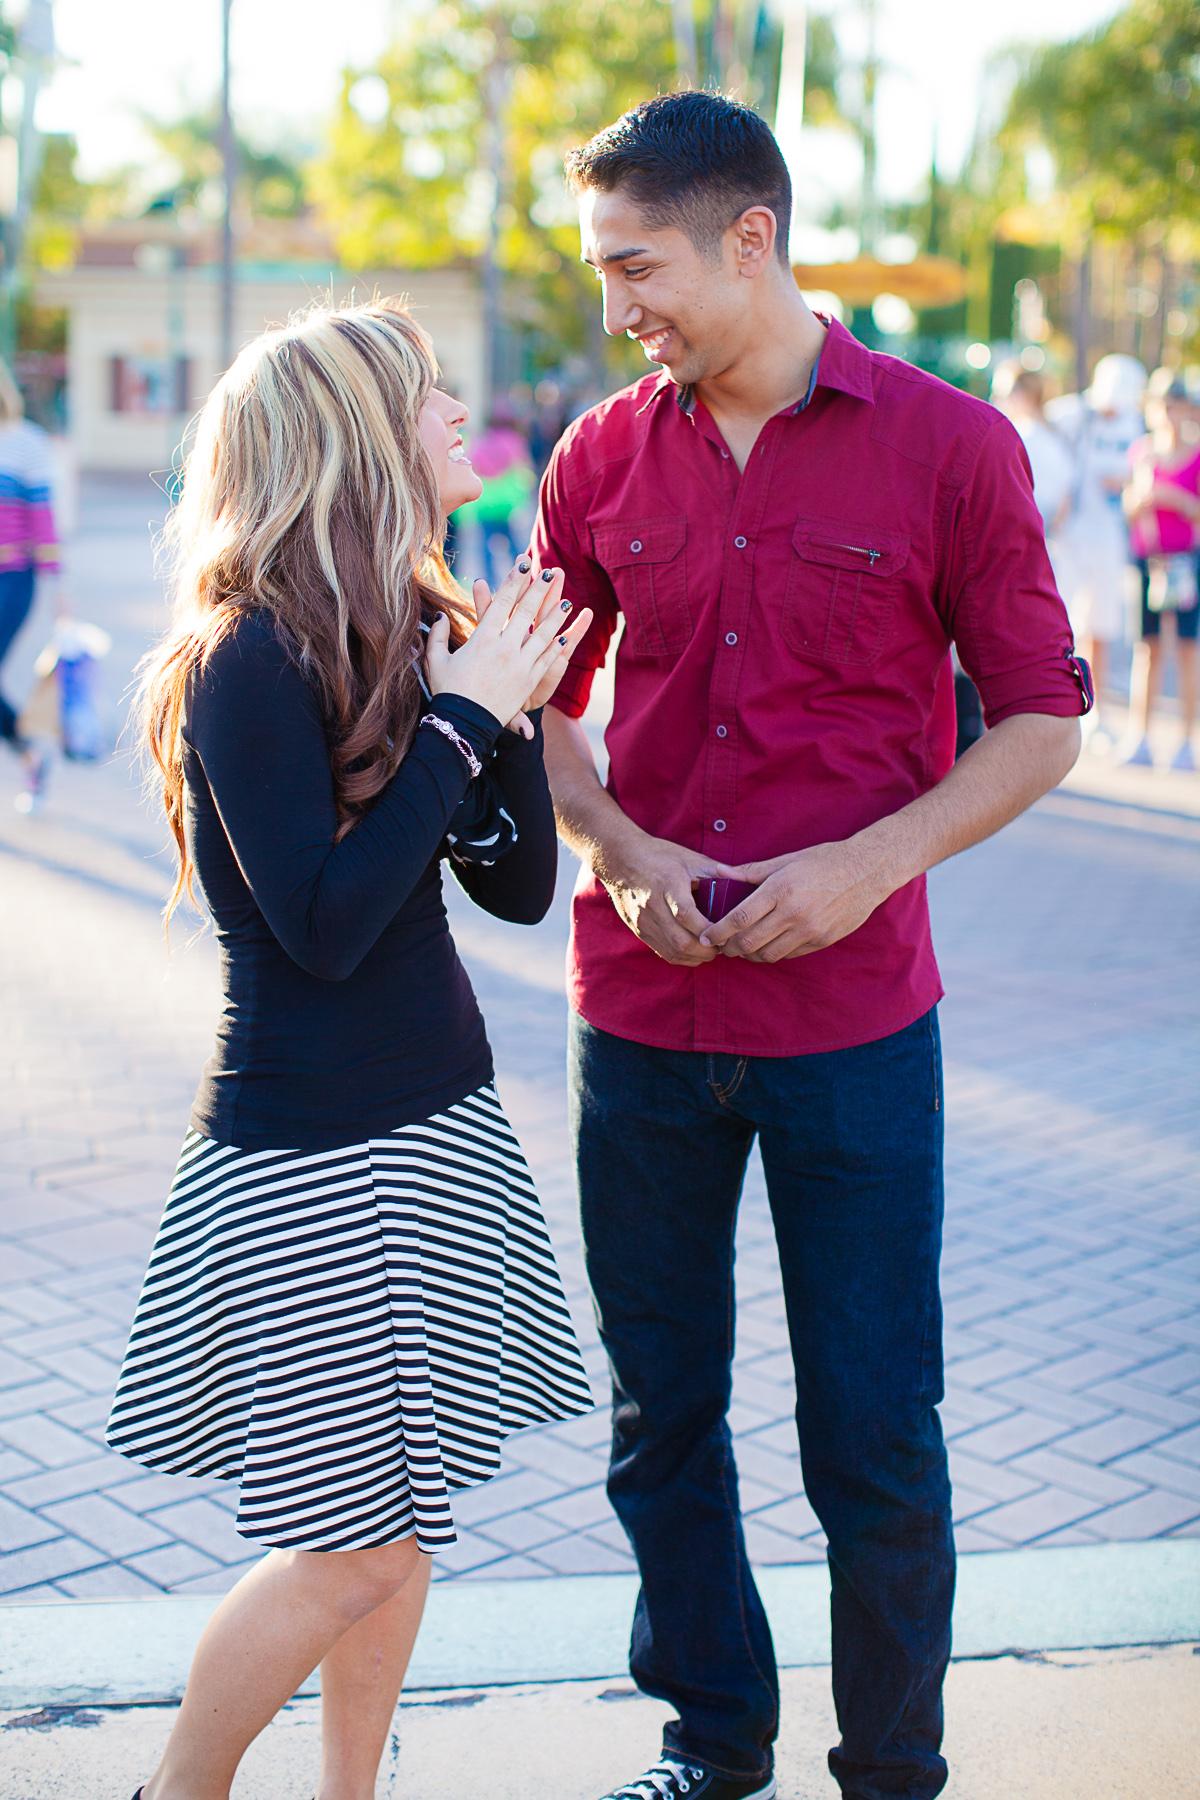 marriage proposal at disney